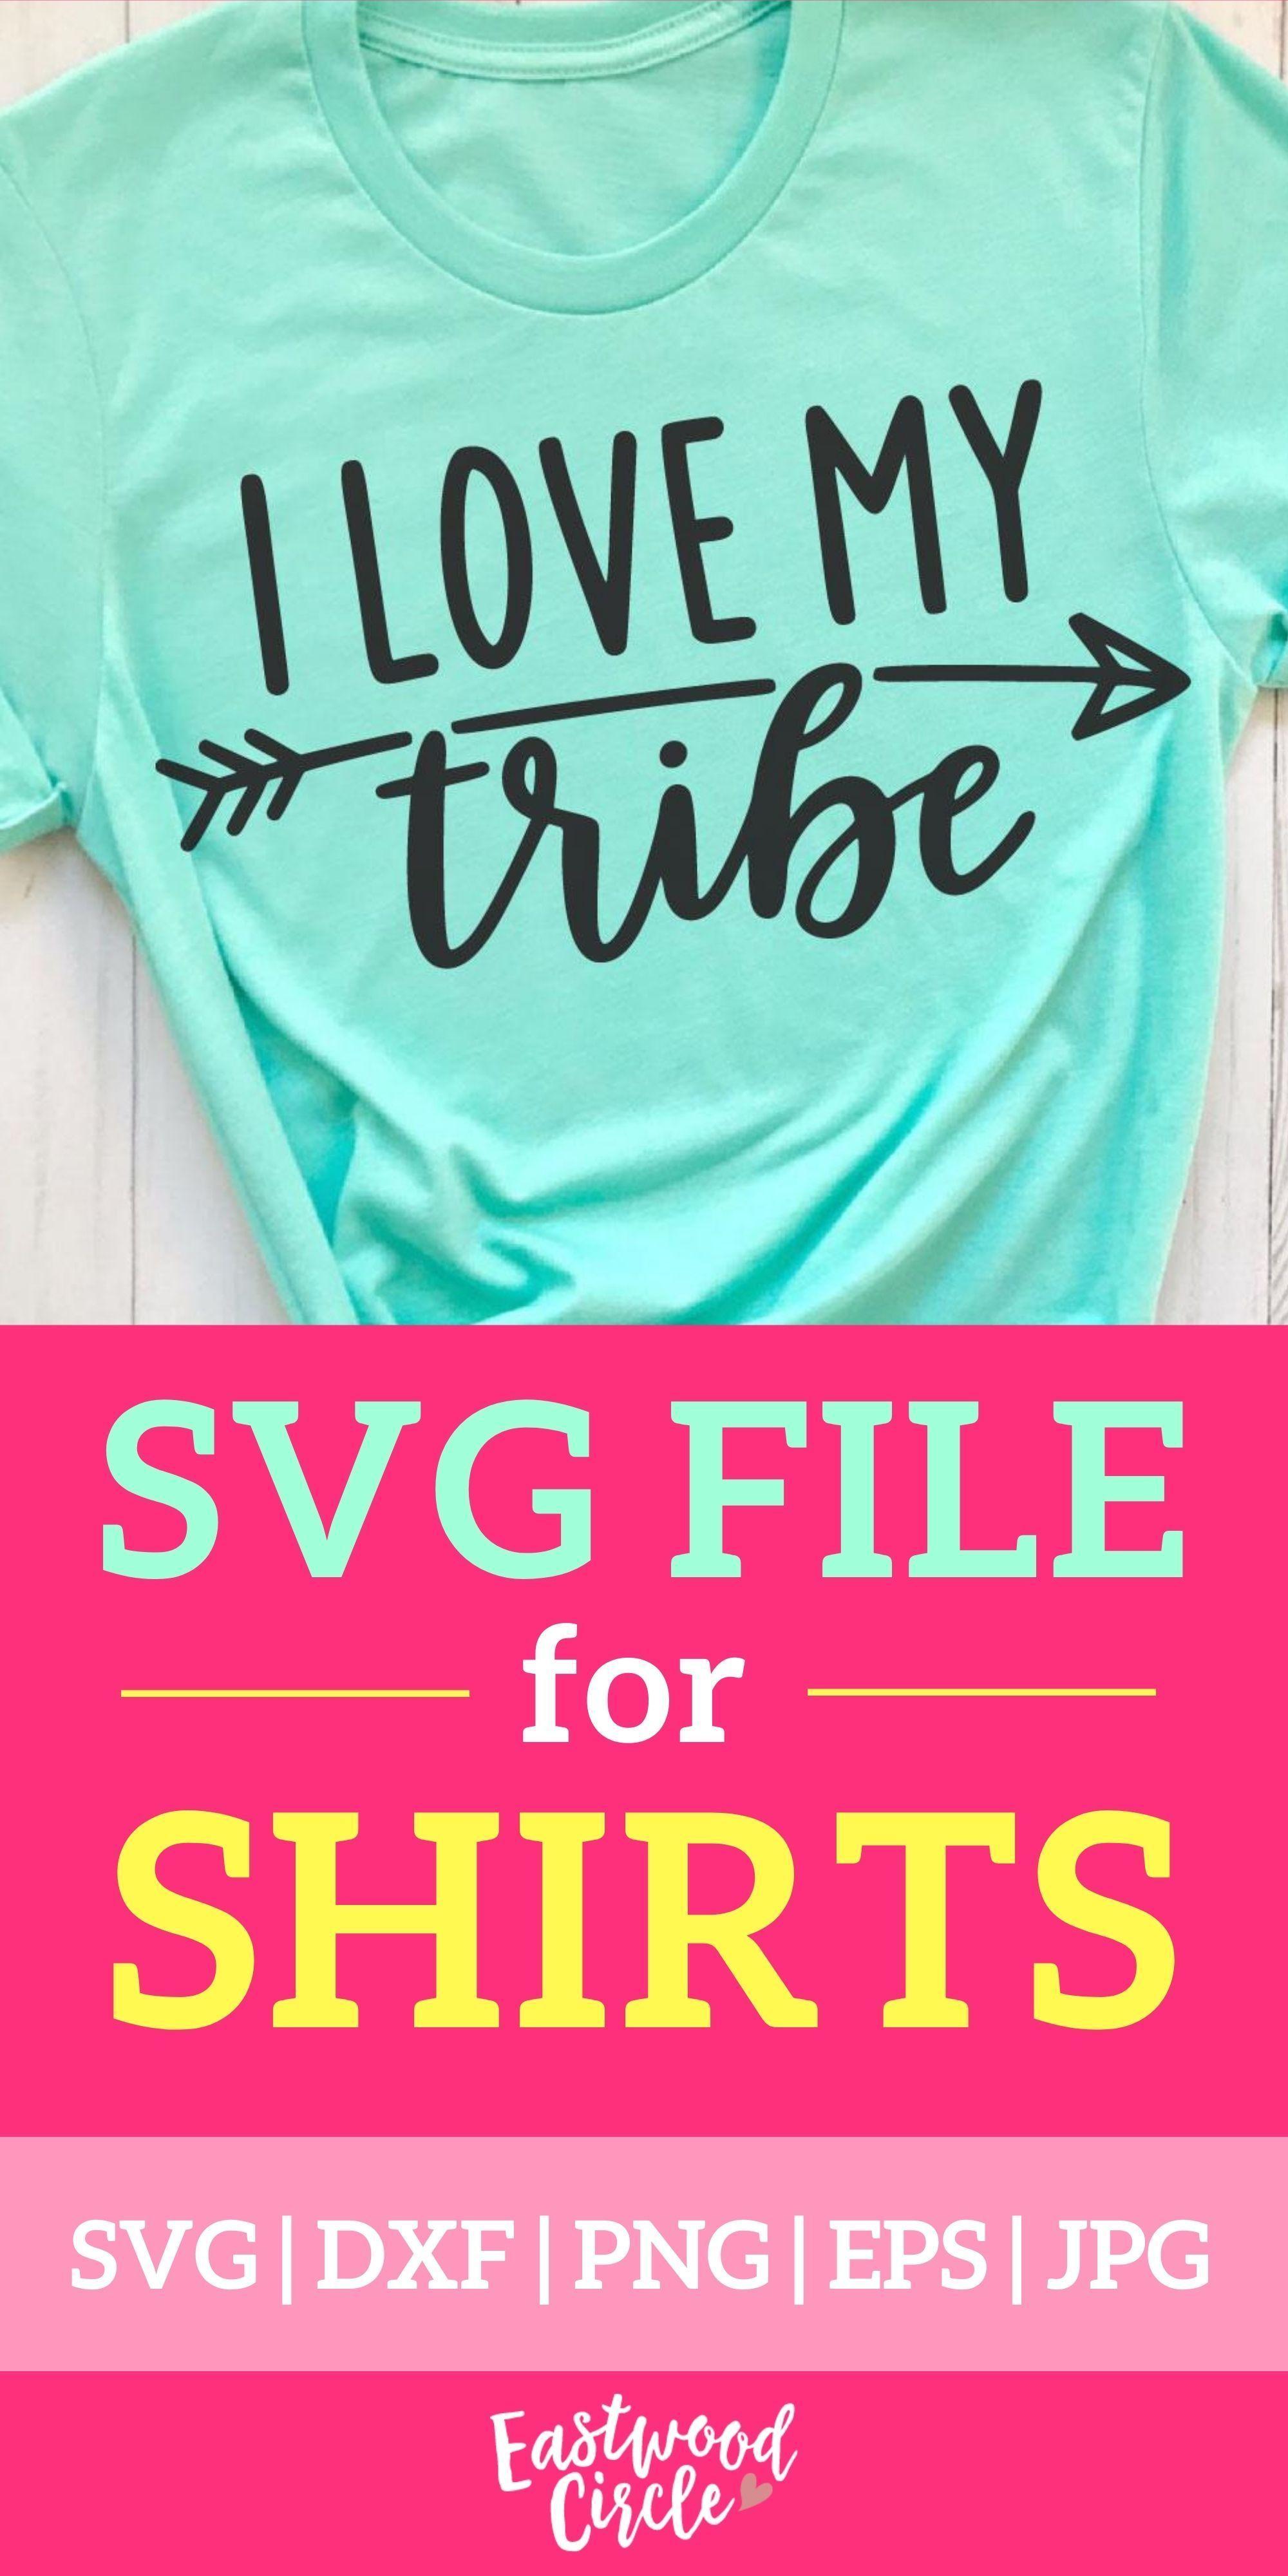 I Love My Tribe svg, Love My Tribe svg, Teacher Shirt svg ...